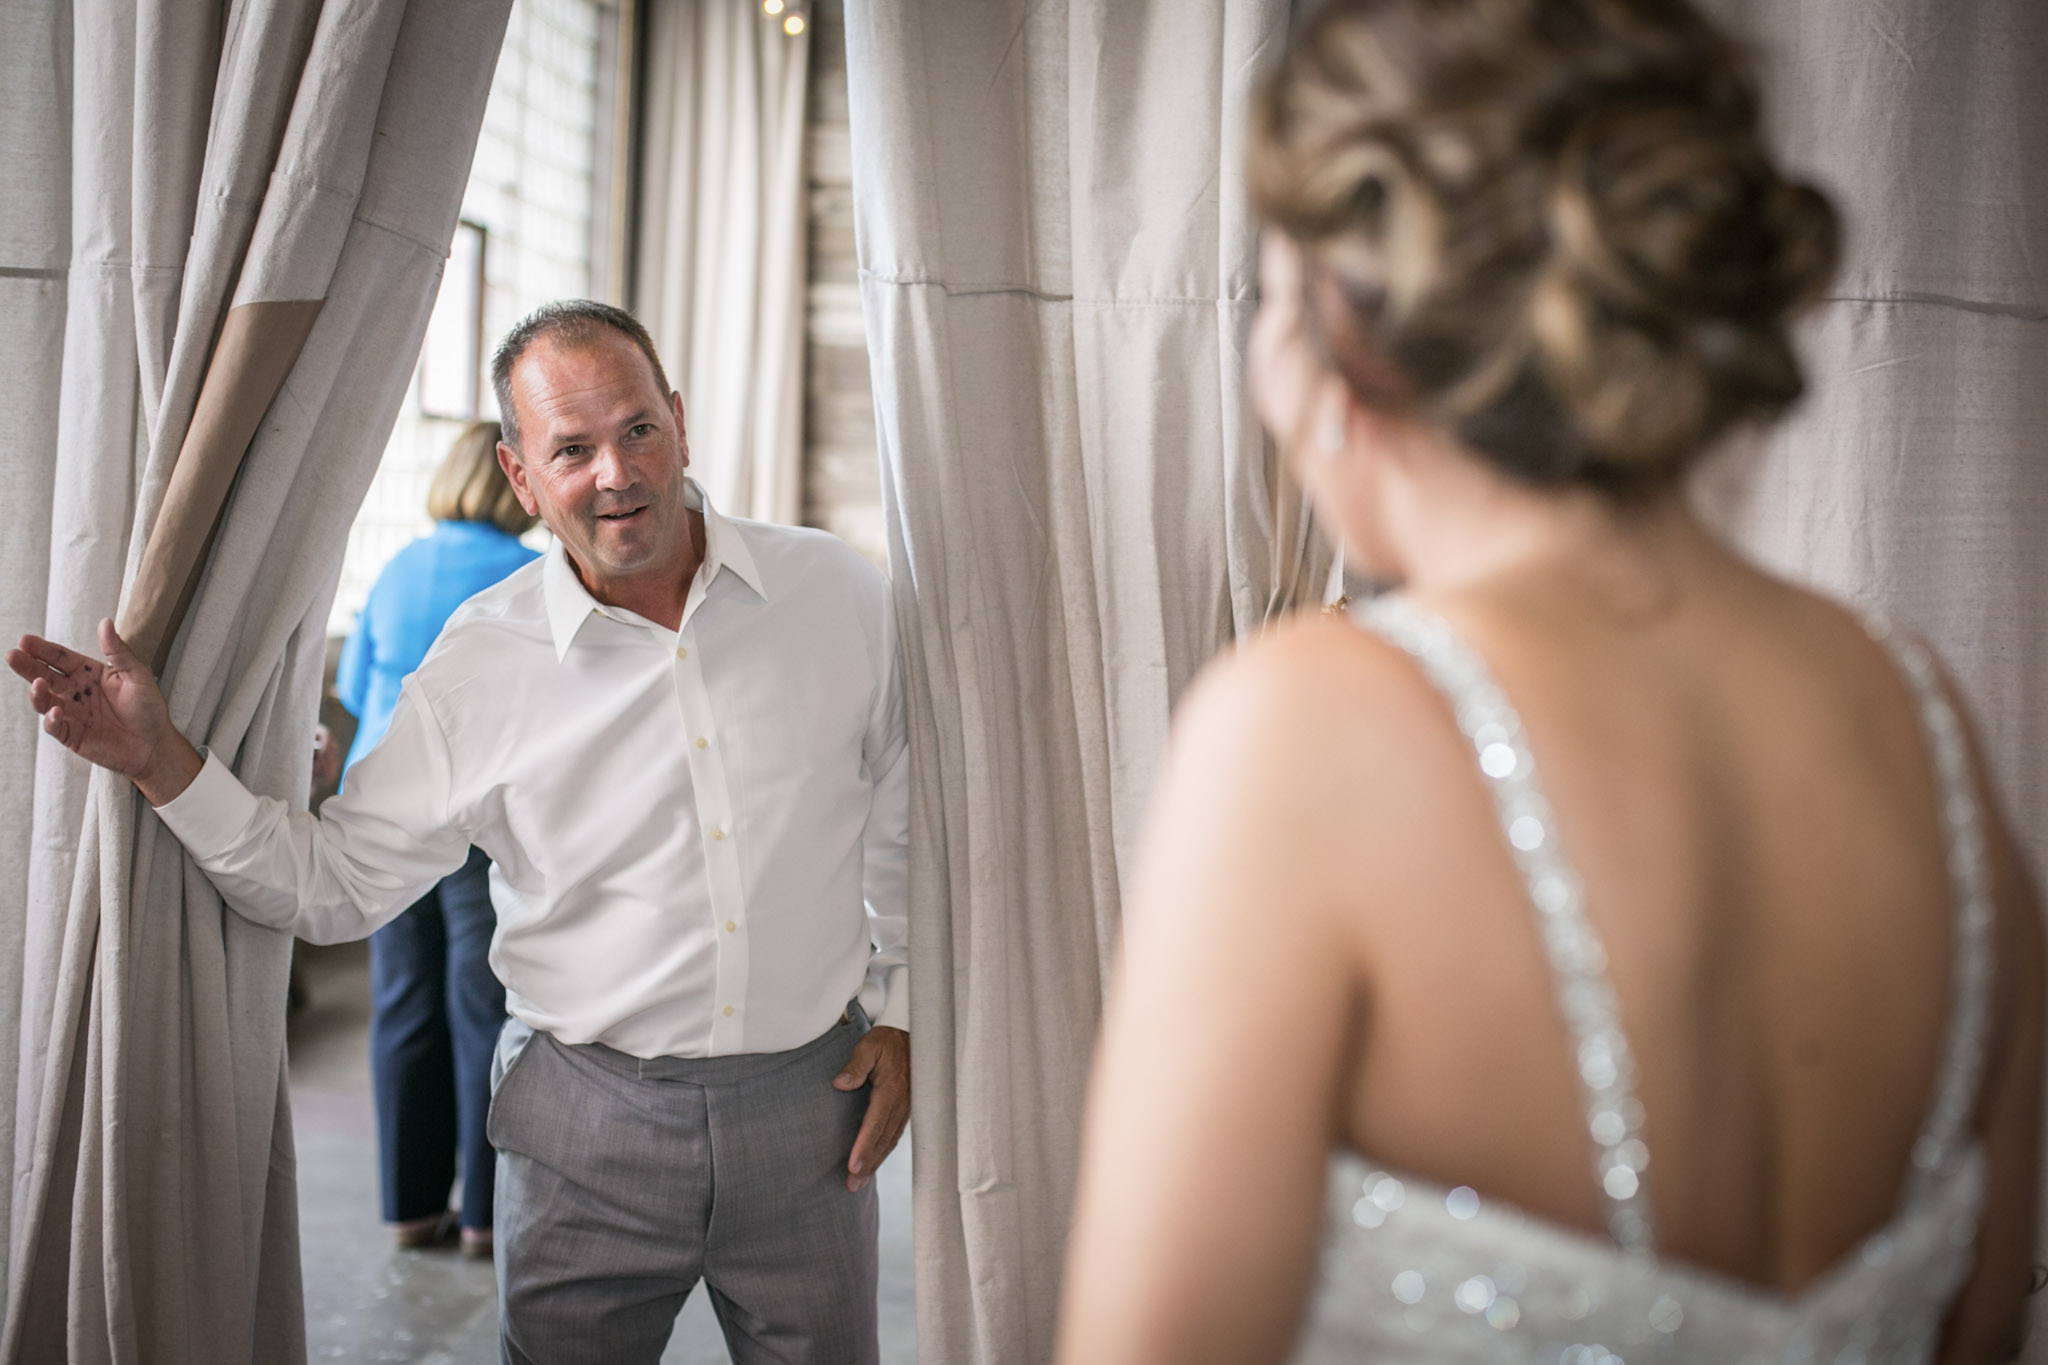 Kansas_City_Small_Wedding_Venue_Elope_Intimate_Ceremony_Budget_Affordable_Mindi&Craig_024.jpg